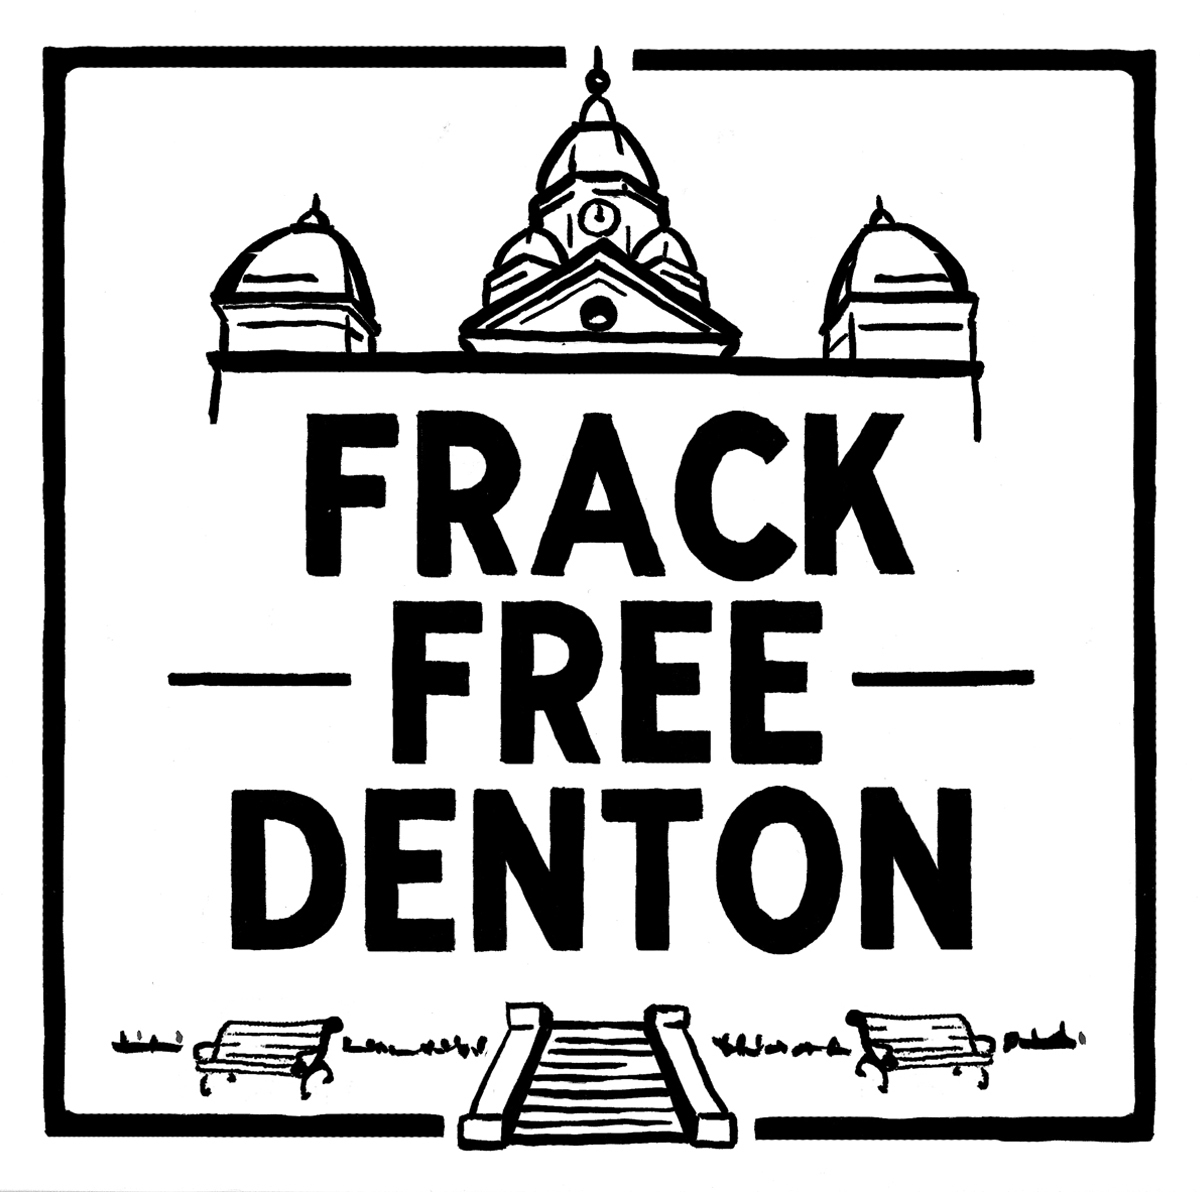 frack-free-denton-sticker